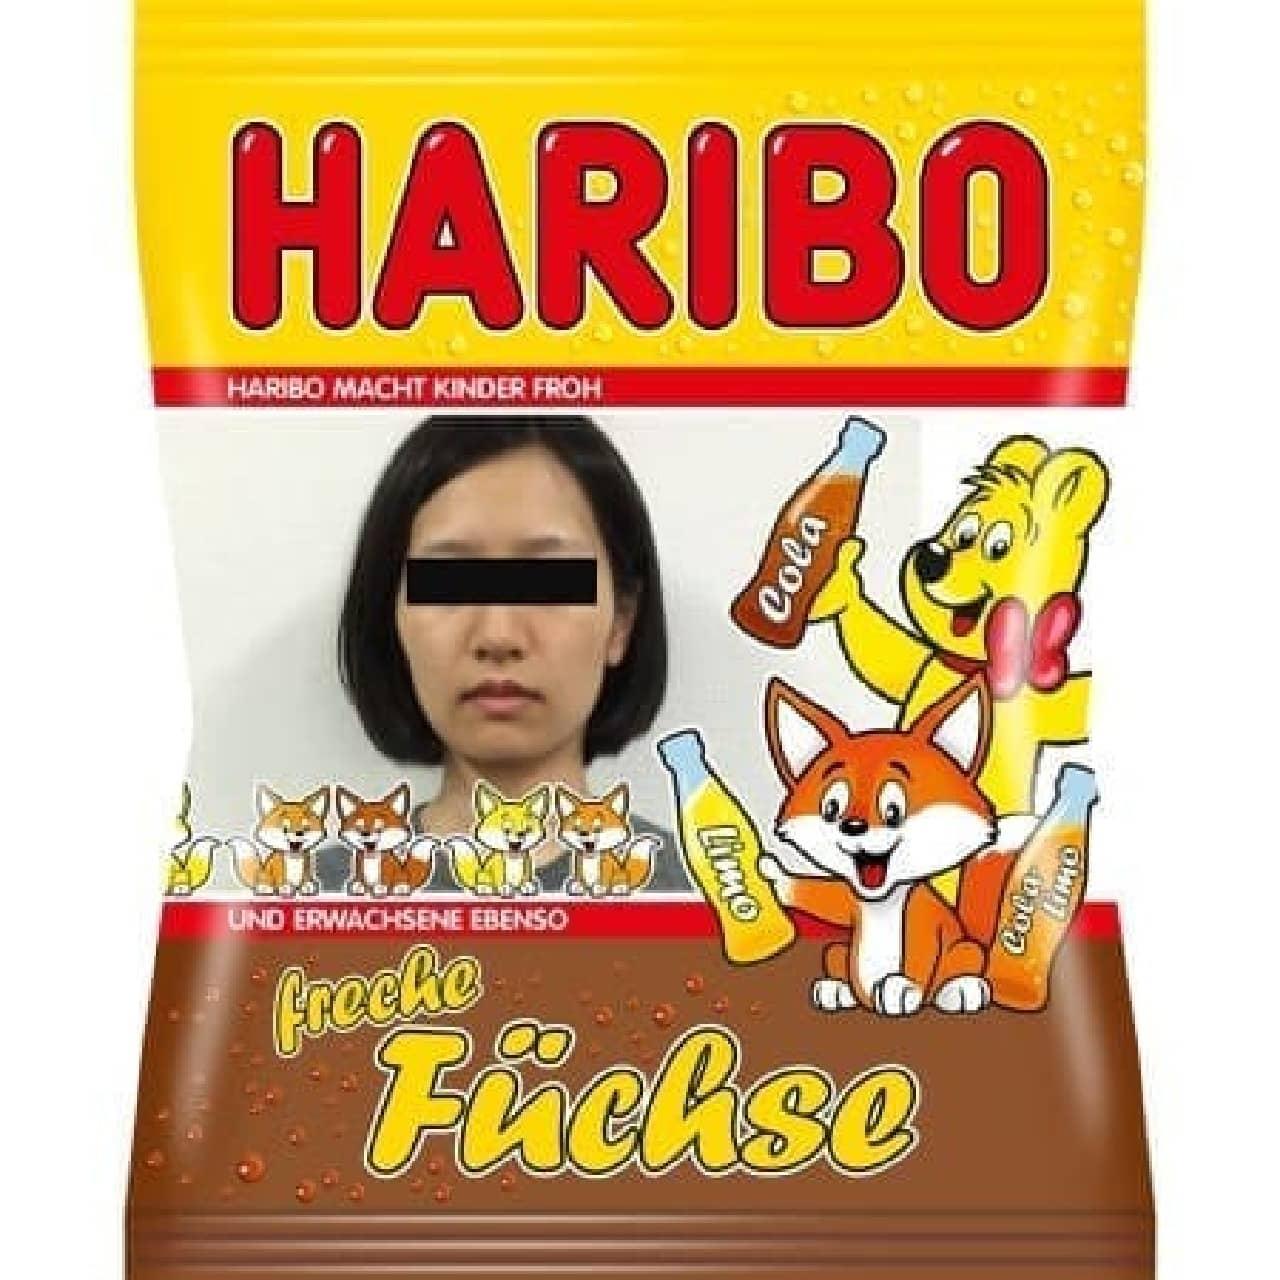 「HARIBO(ハリボー)」のフォトフレーム チーキーフォックス